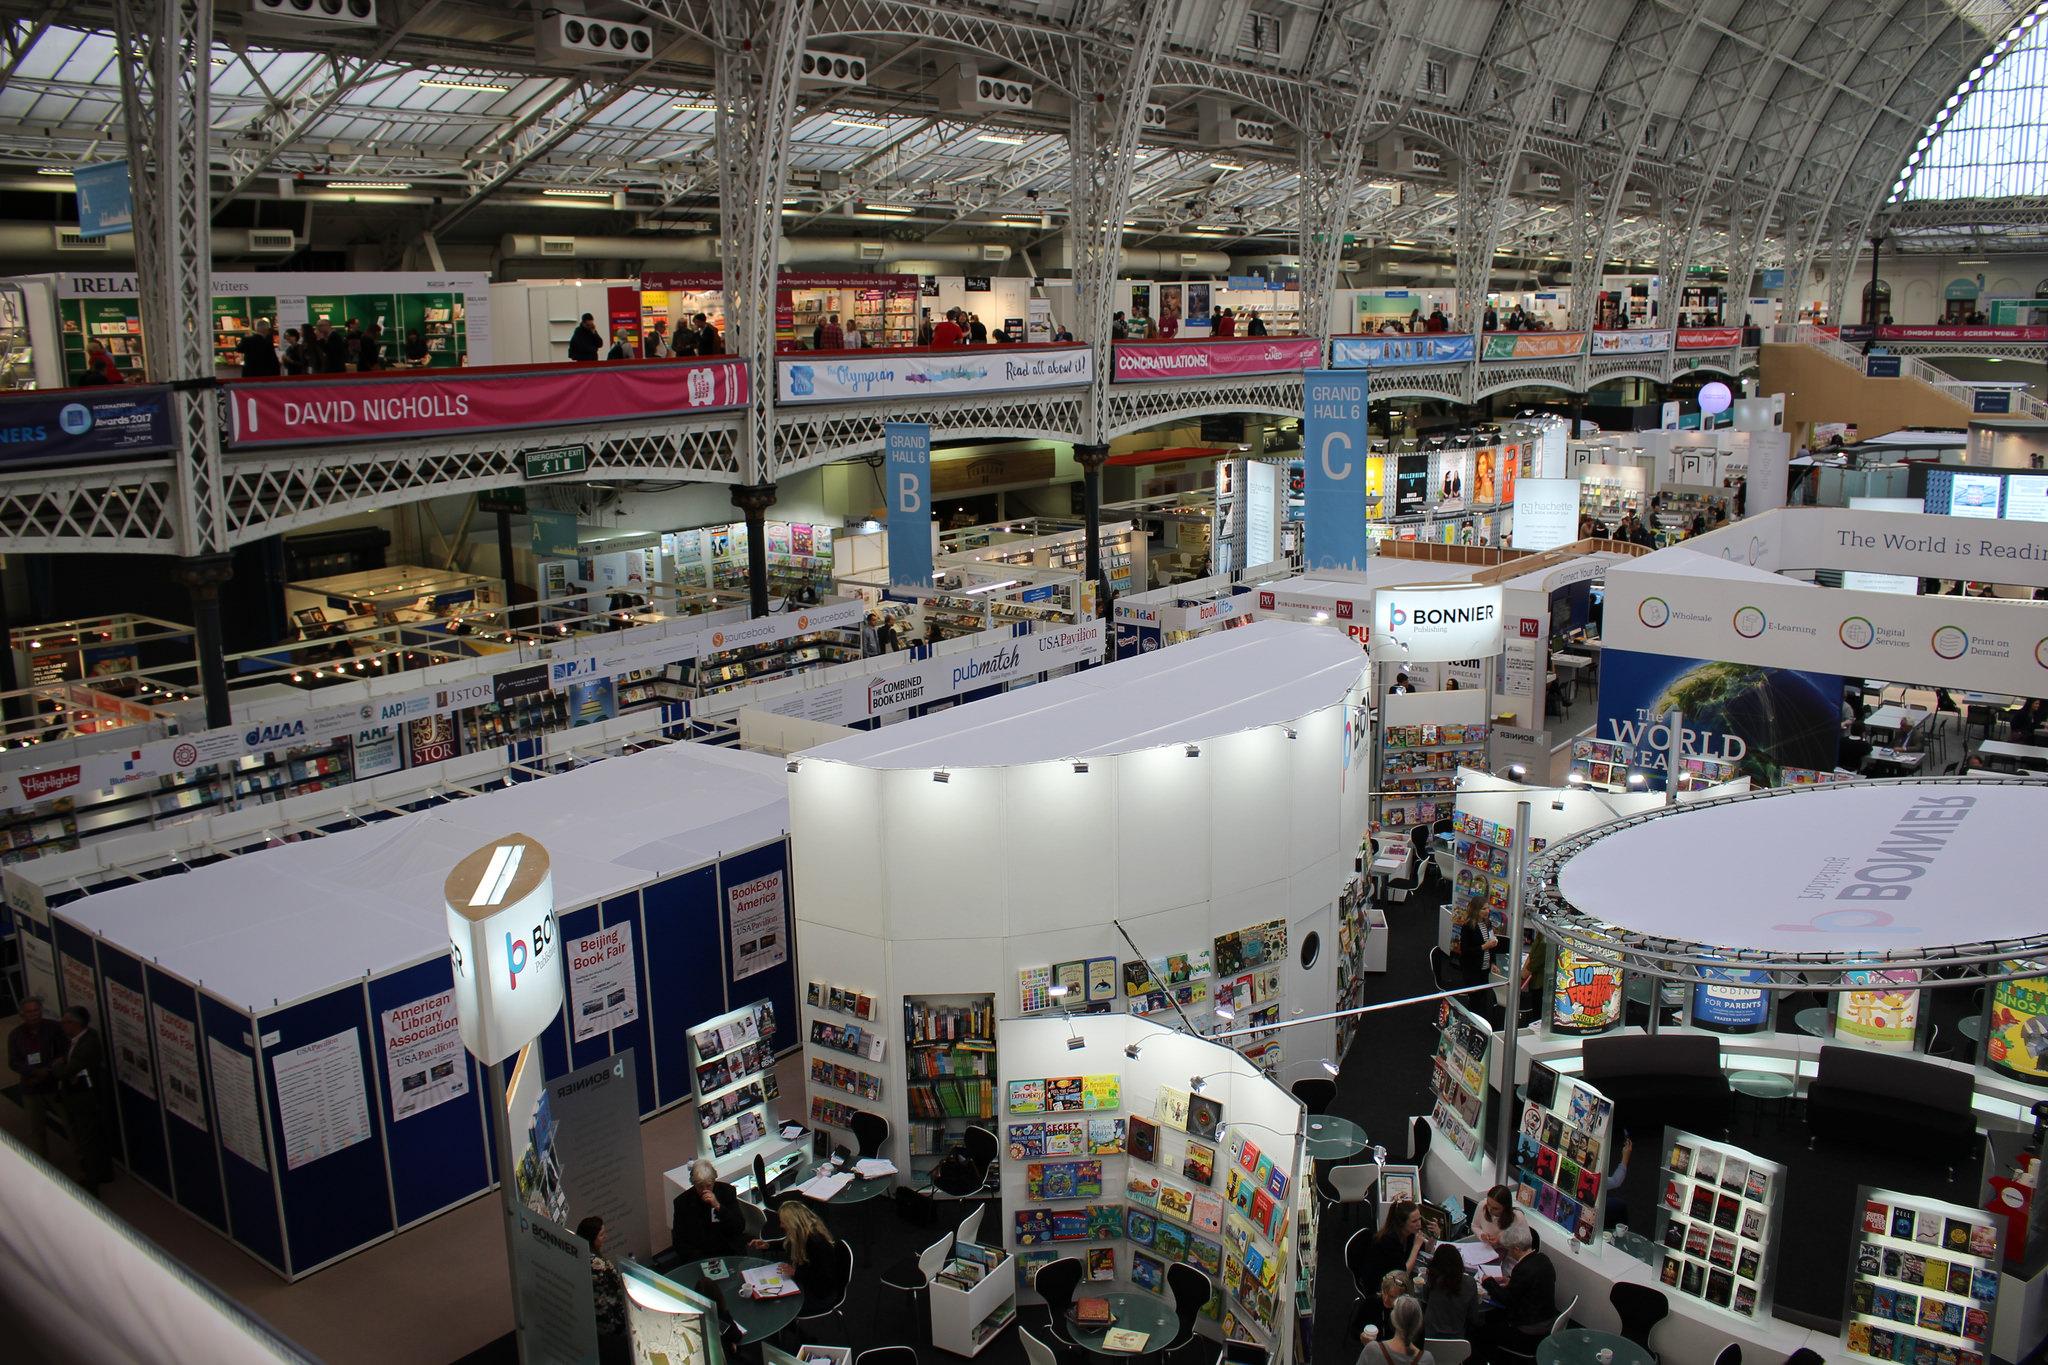 Meet with Bookswarm at London Book Fair 2020